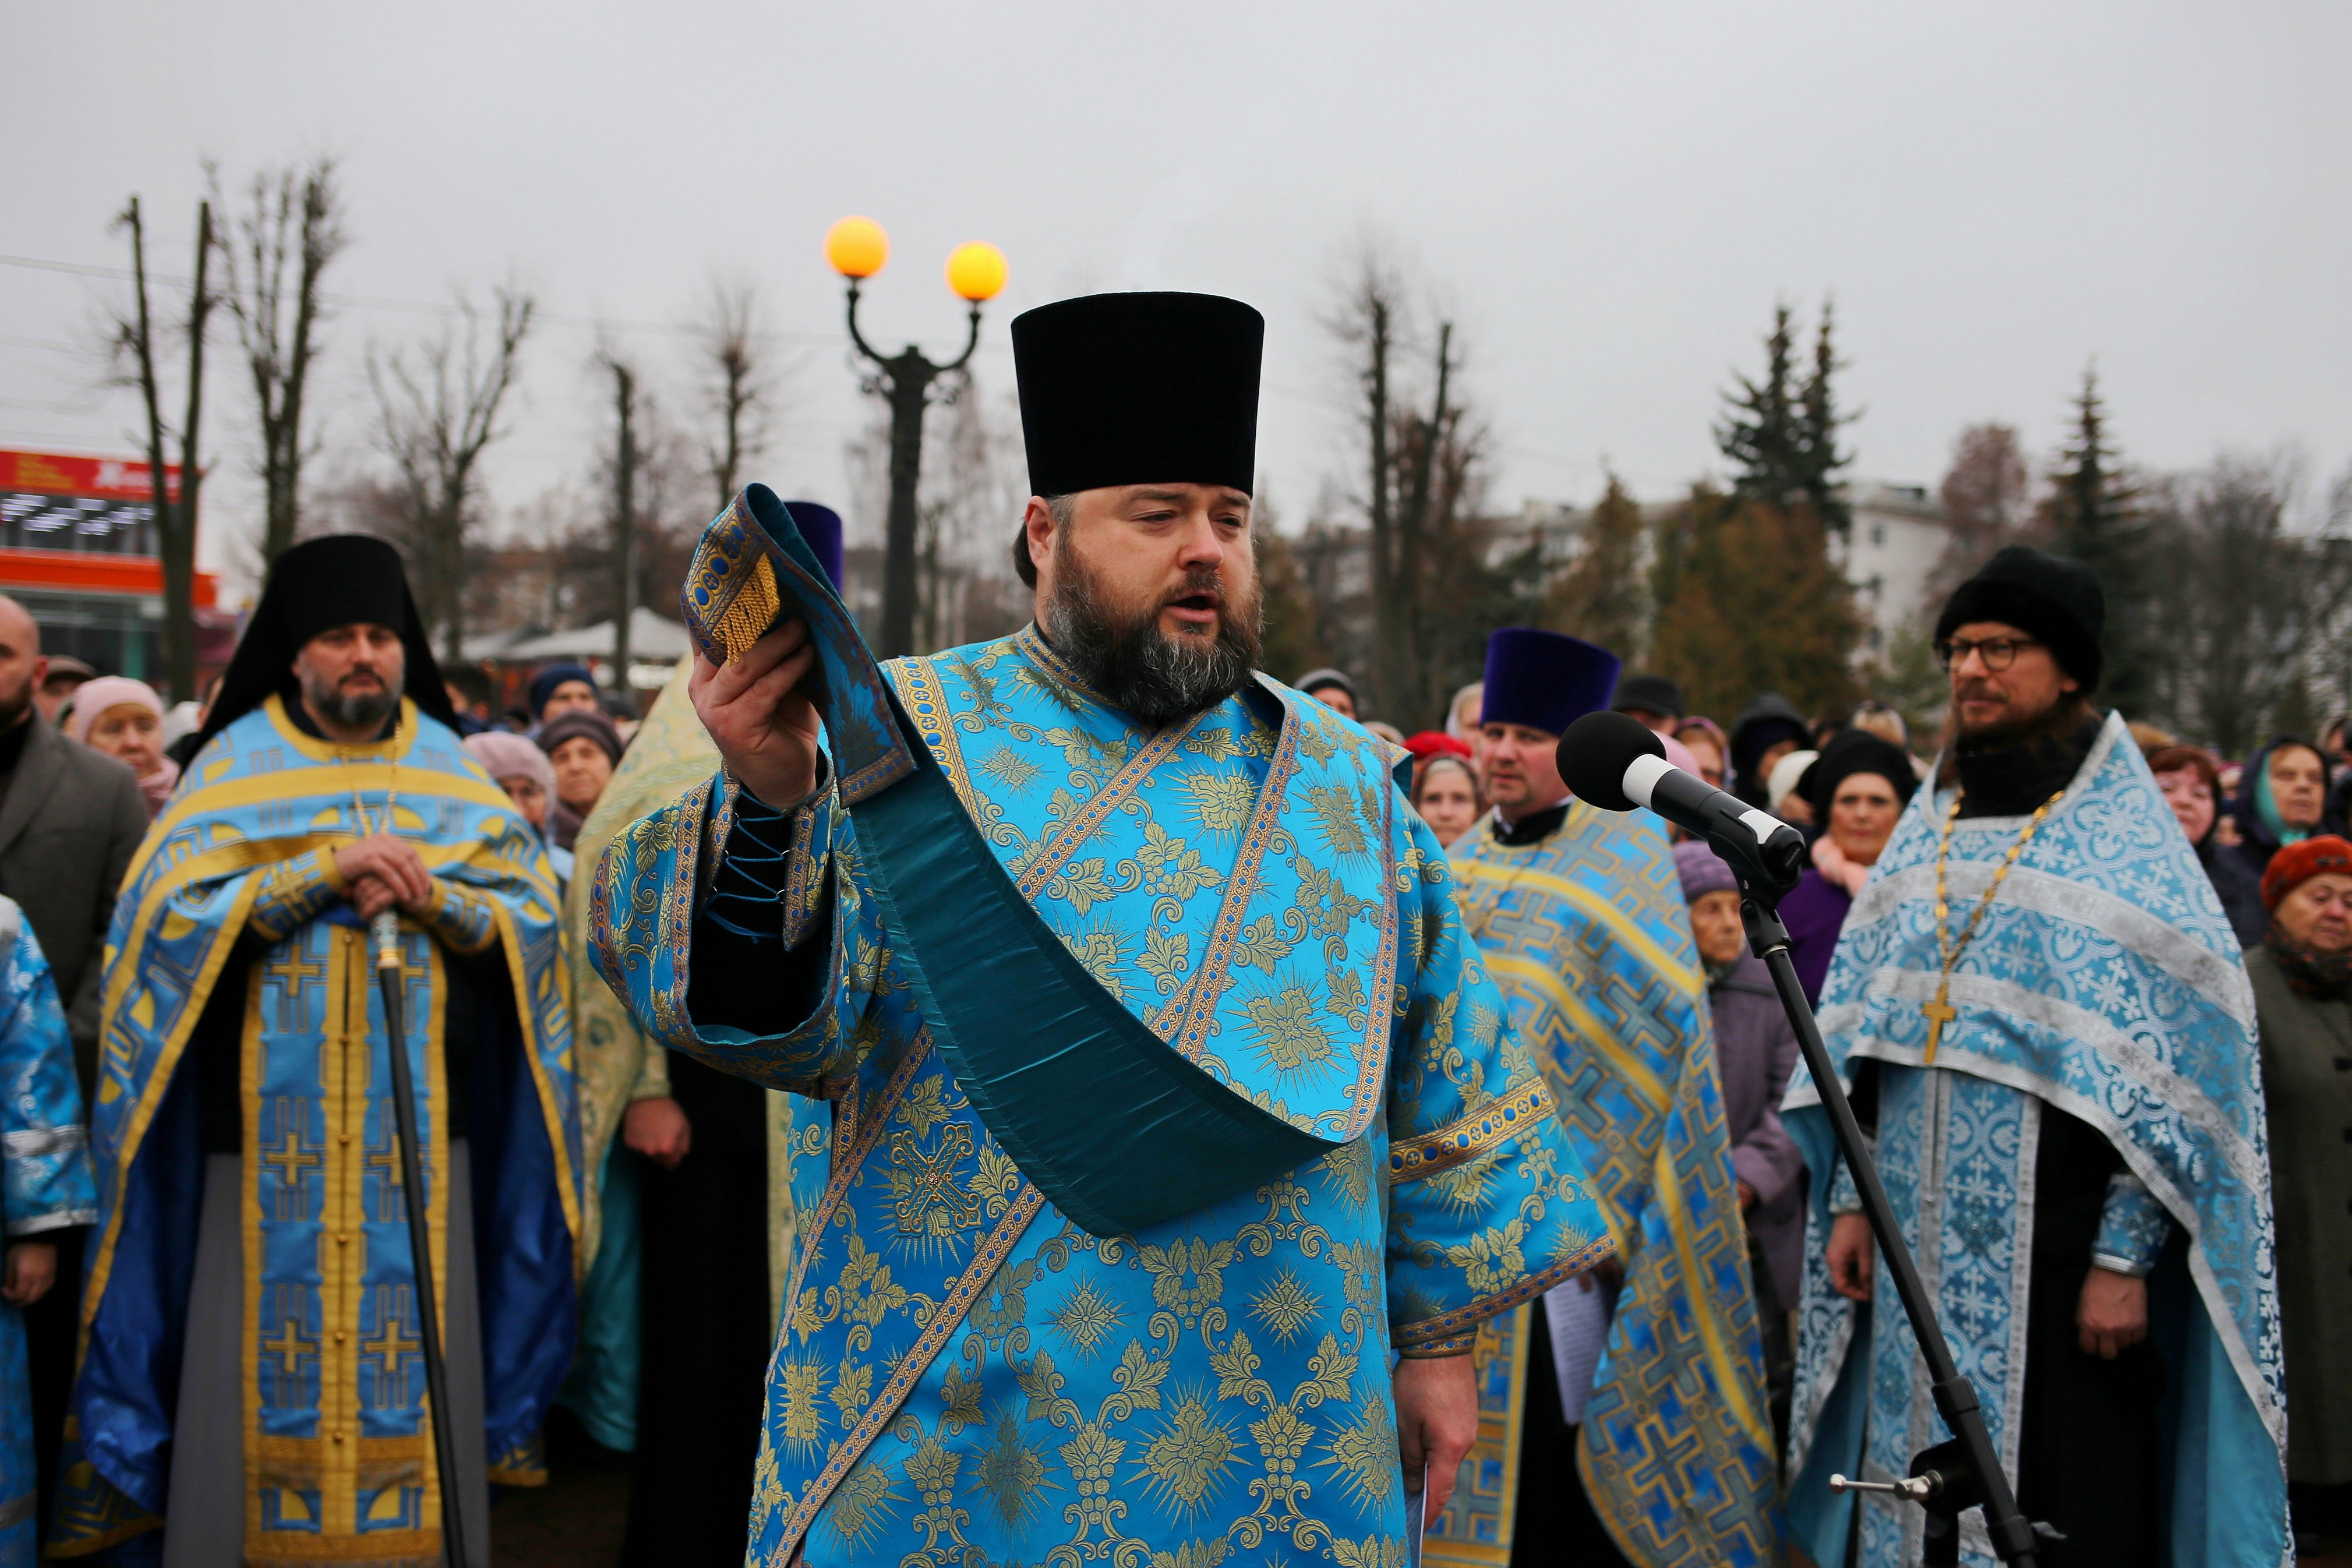 http://monuspen.ru/photoreports/e885ad143ffeae12541ceee7e7725b2m.jpg